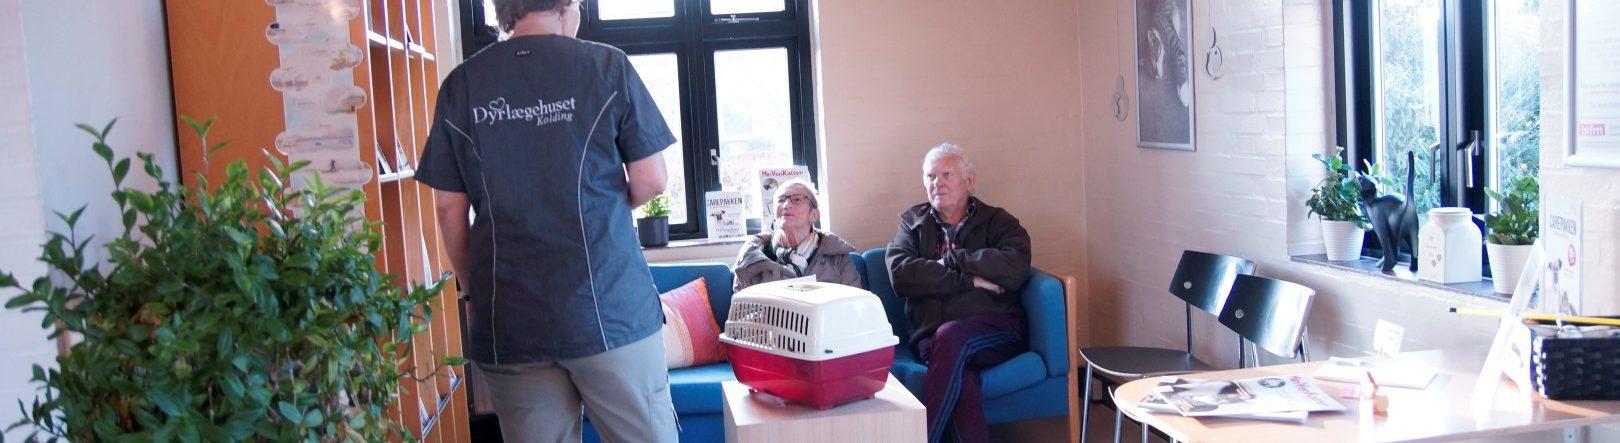 Kattevenlig klinik i Kolding – et trygt valg for din kat | Dyrlægehuset Kolding